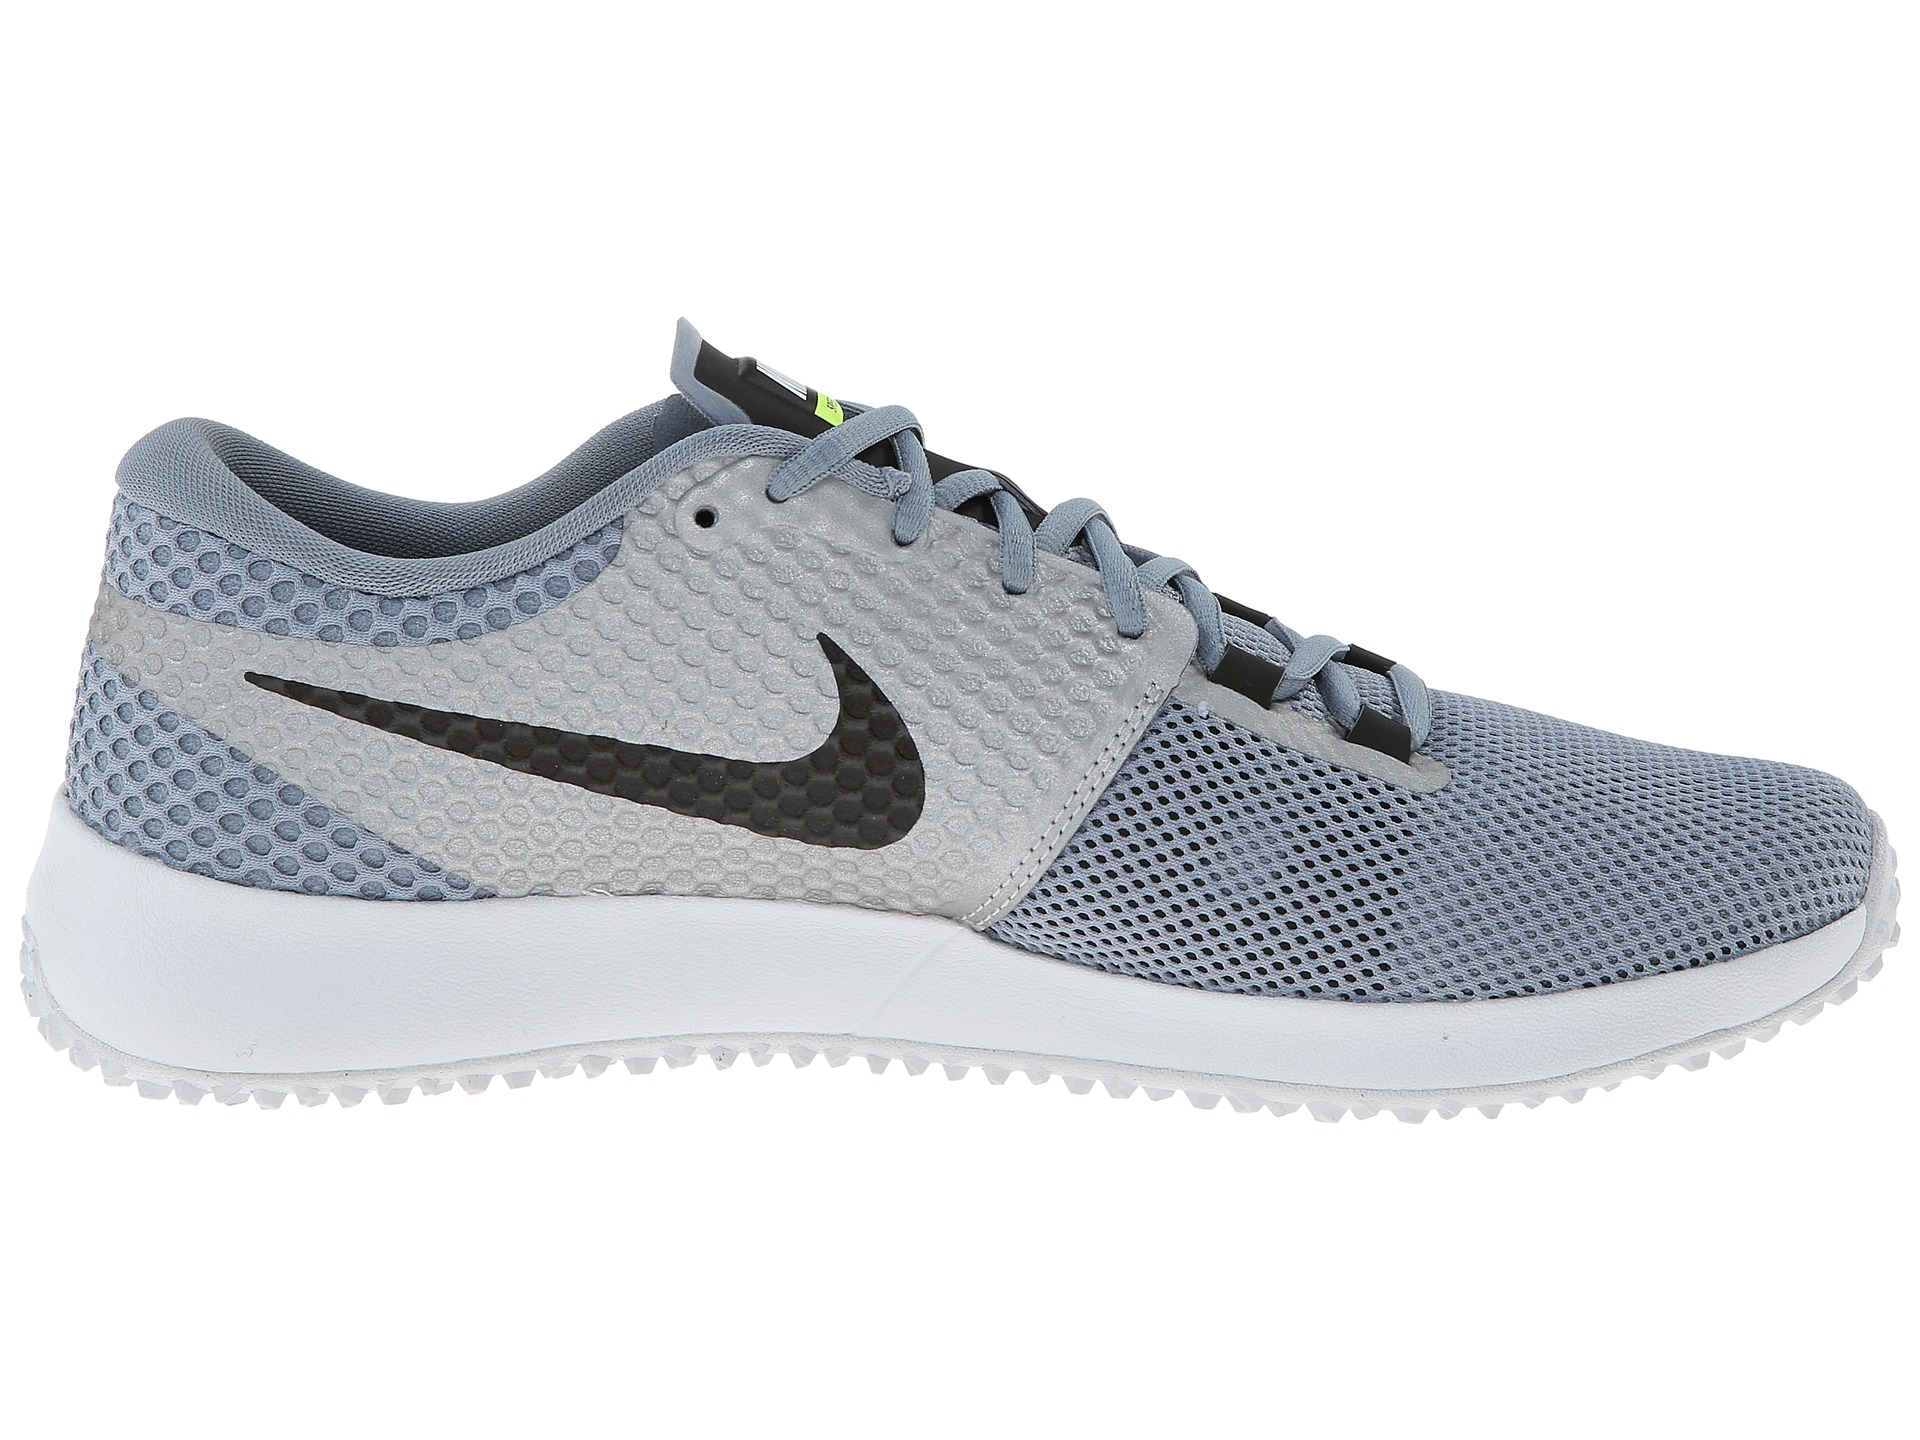 san francisco 54c89 c1bf4 Nike Air Zoom Hyperace White